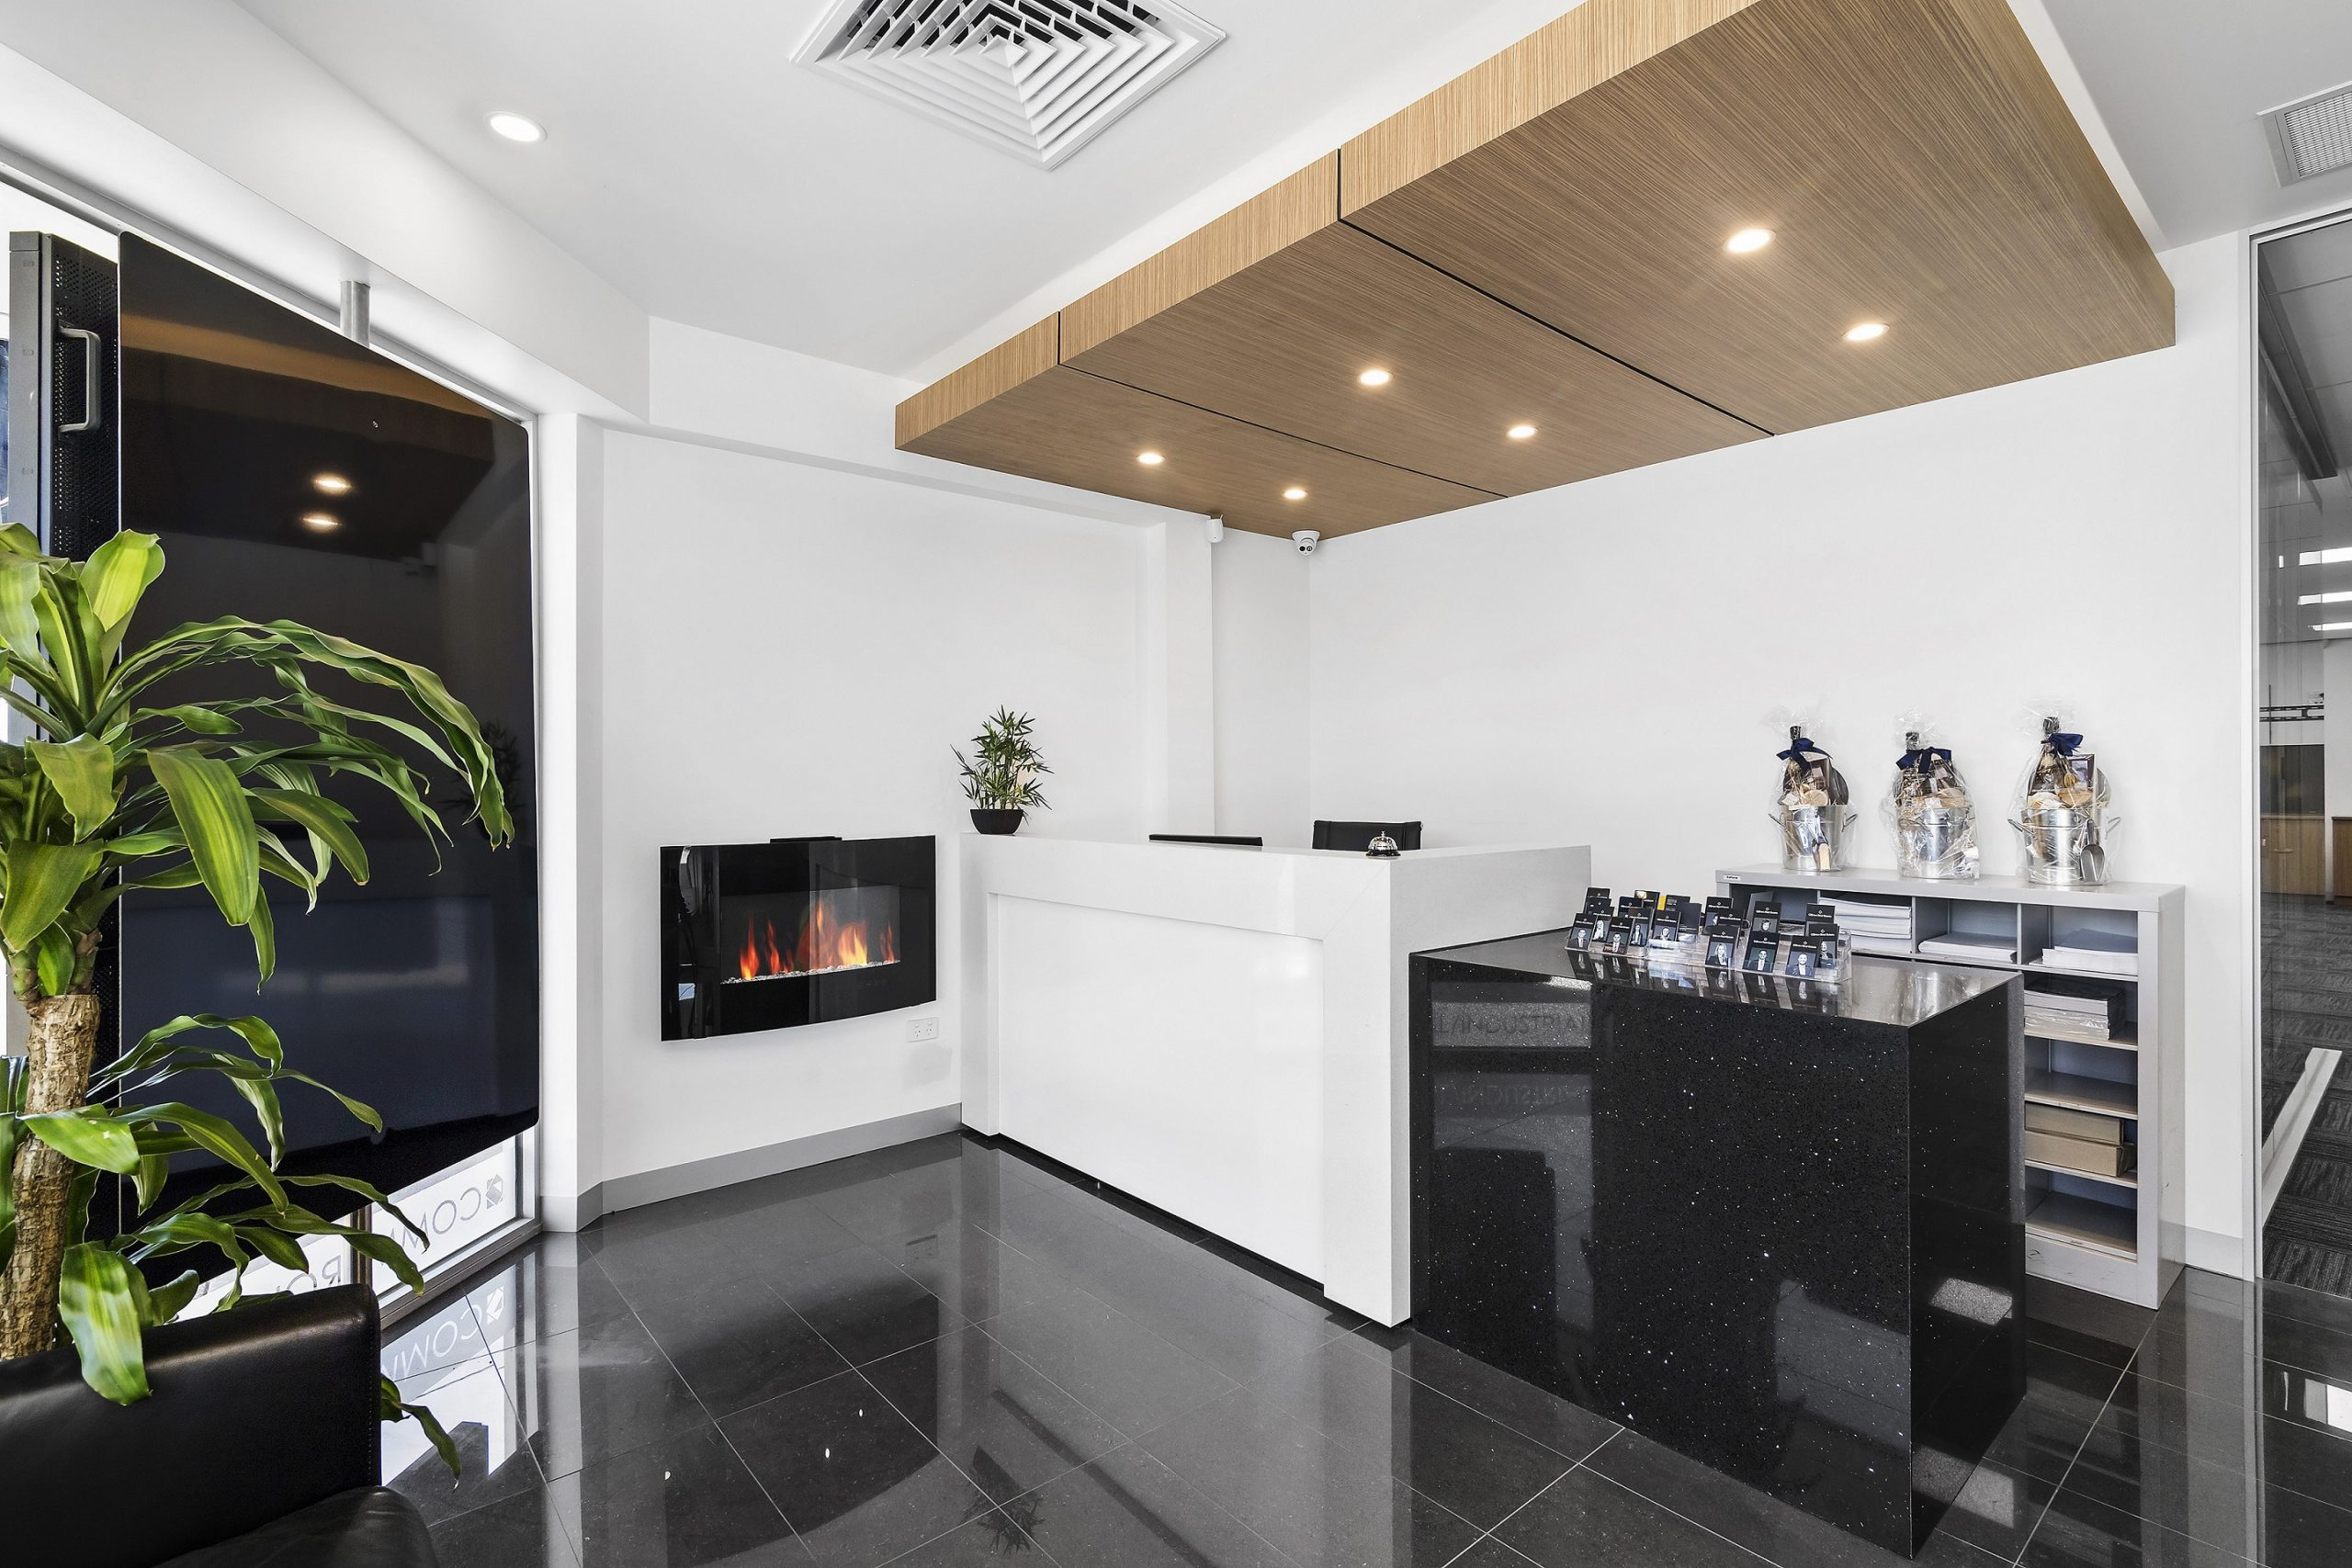 OBrien Real Estate Agents Chelsea